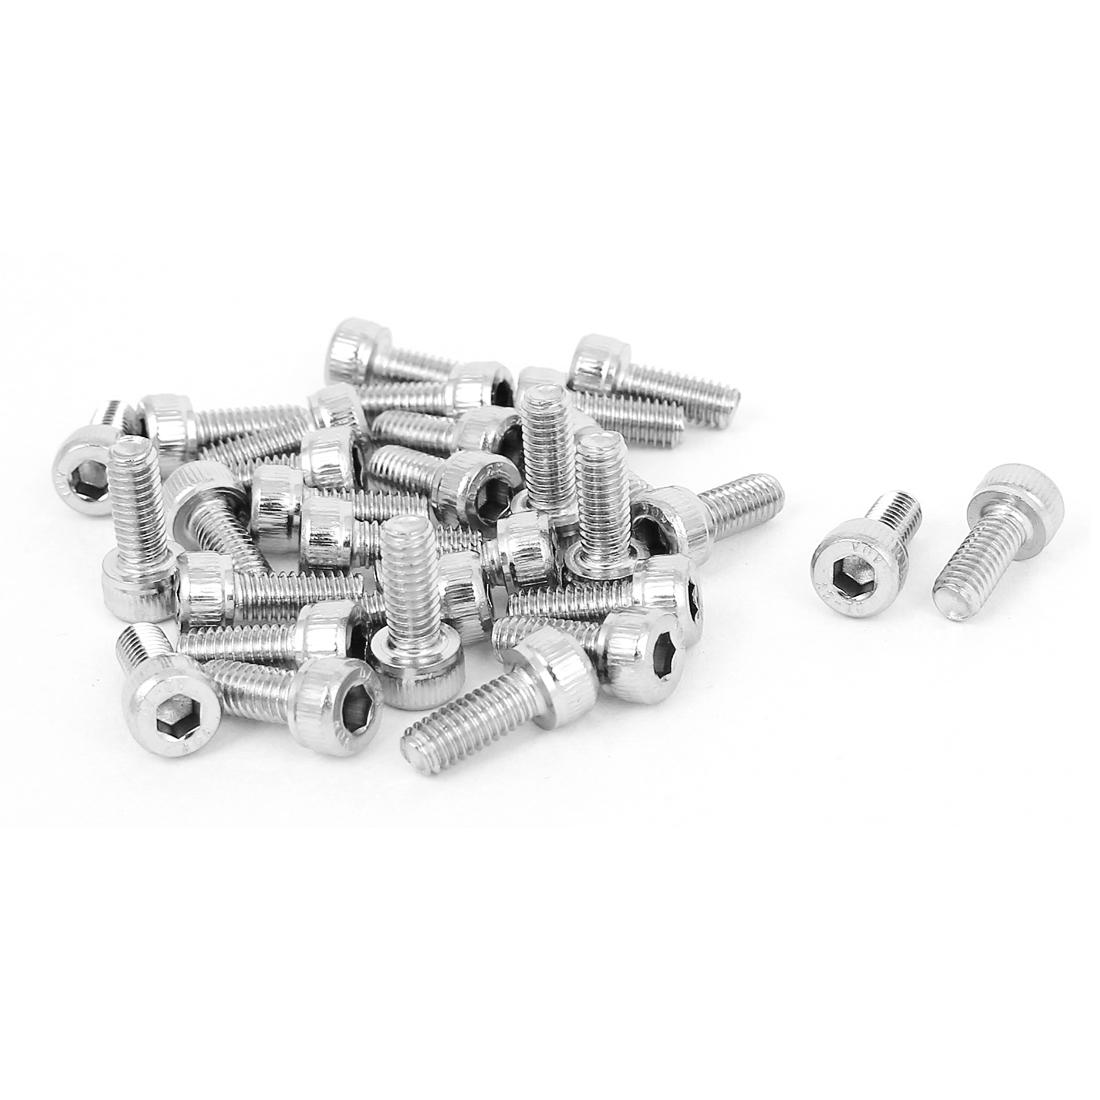 7mm Diameter M4x10mm Stainless Steel Socket Head Cap Key Machine Screws 30 Pcs